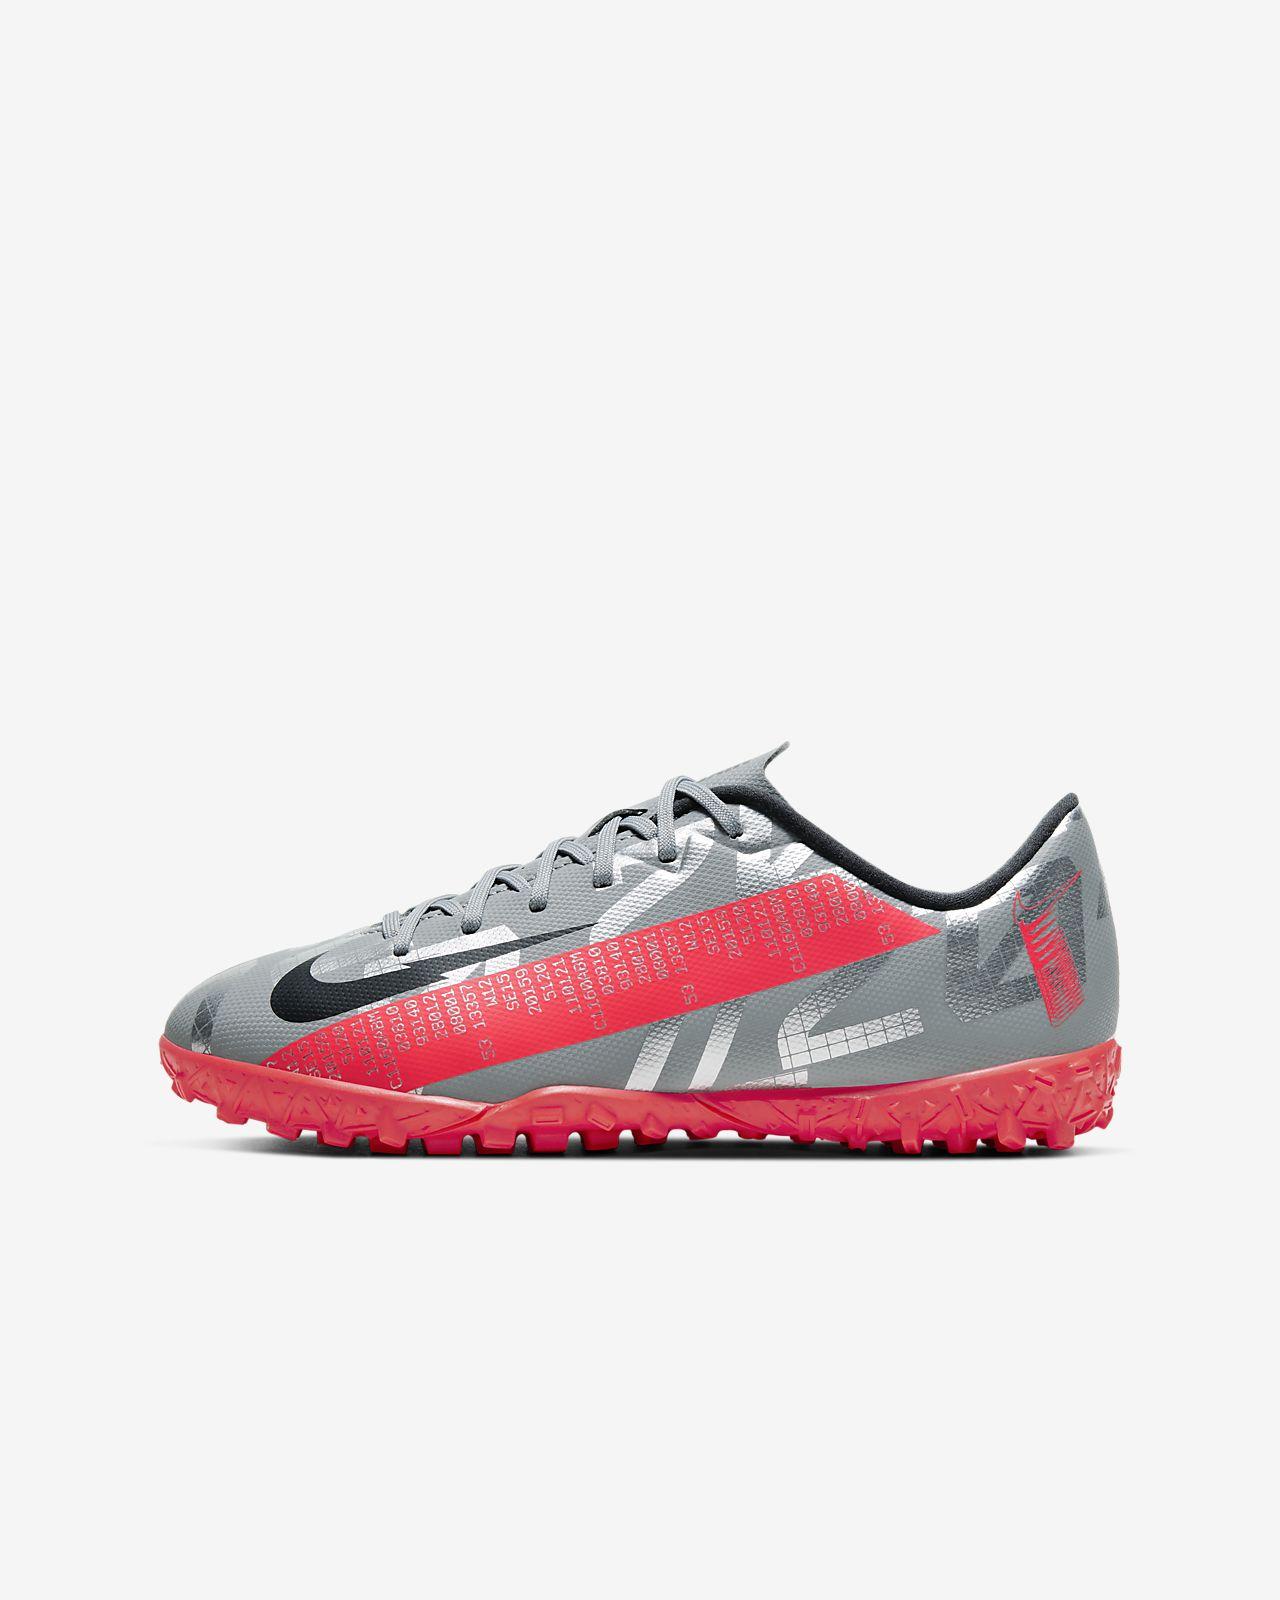 Cristiano Ronaldo Football Shoes. Nike GB